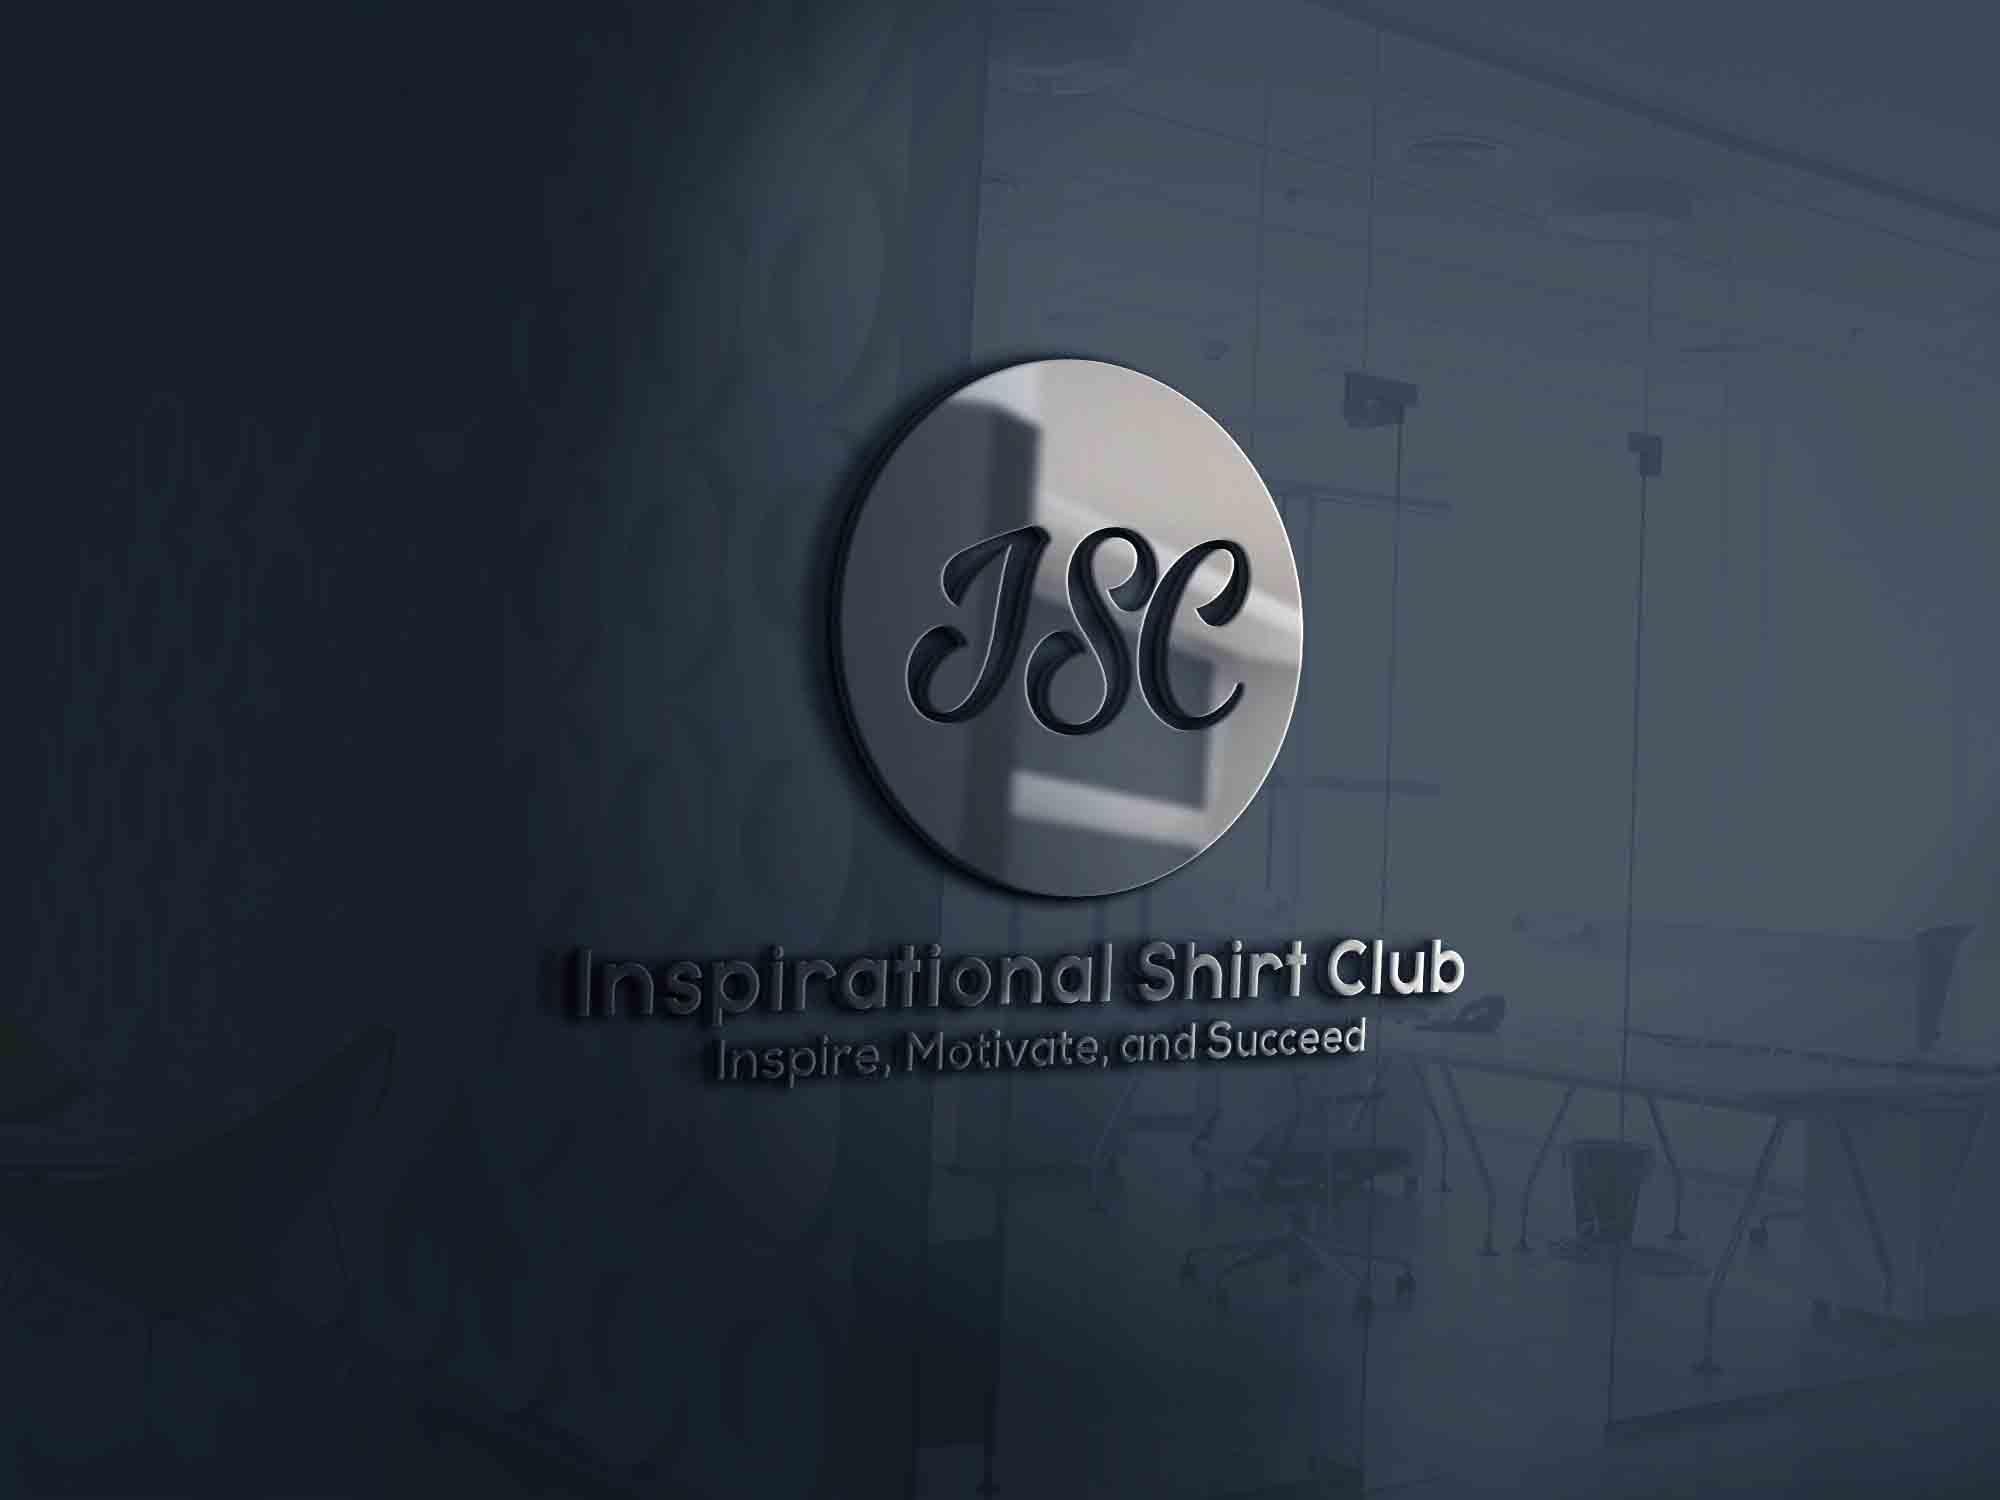 InspirationalShirtclub